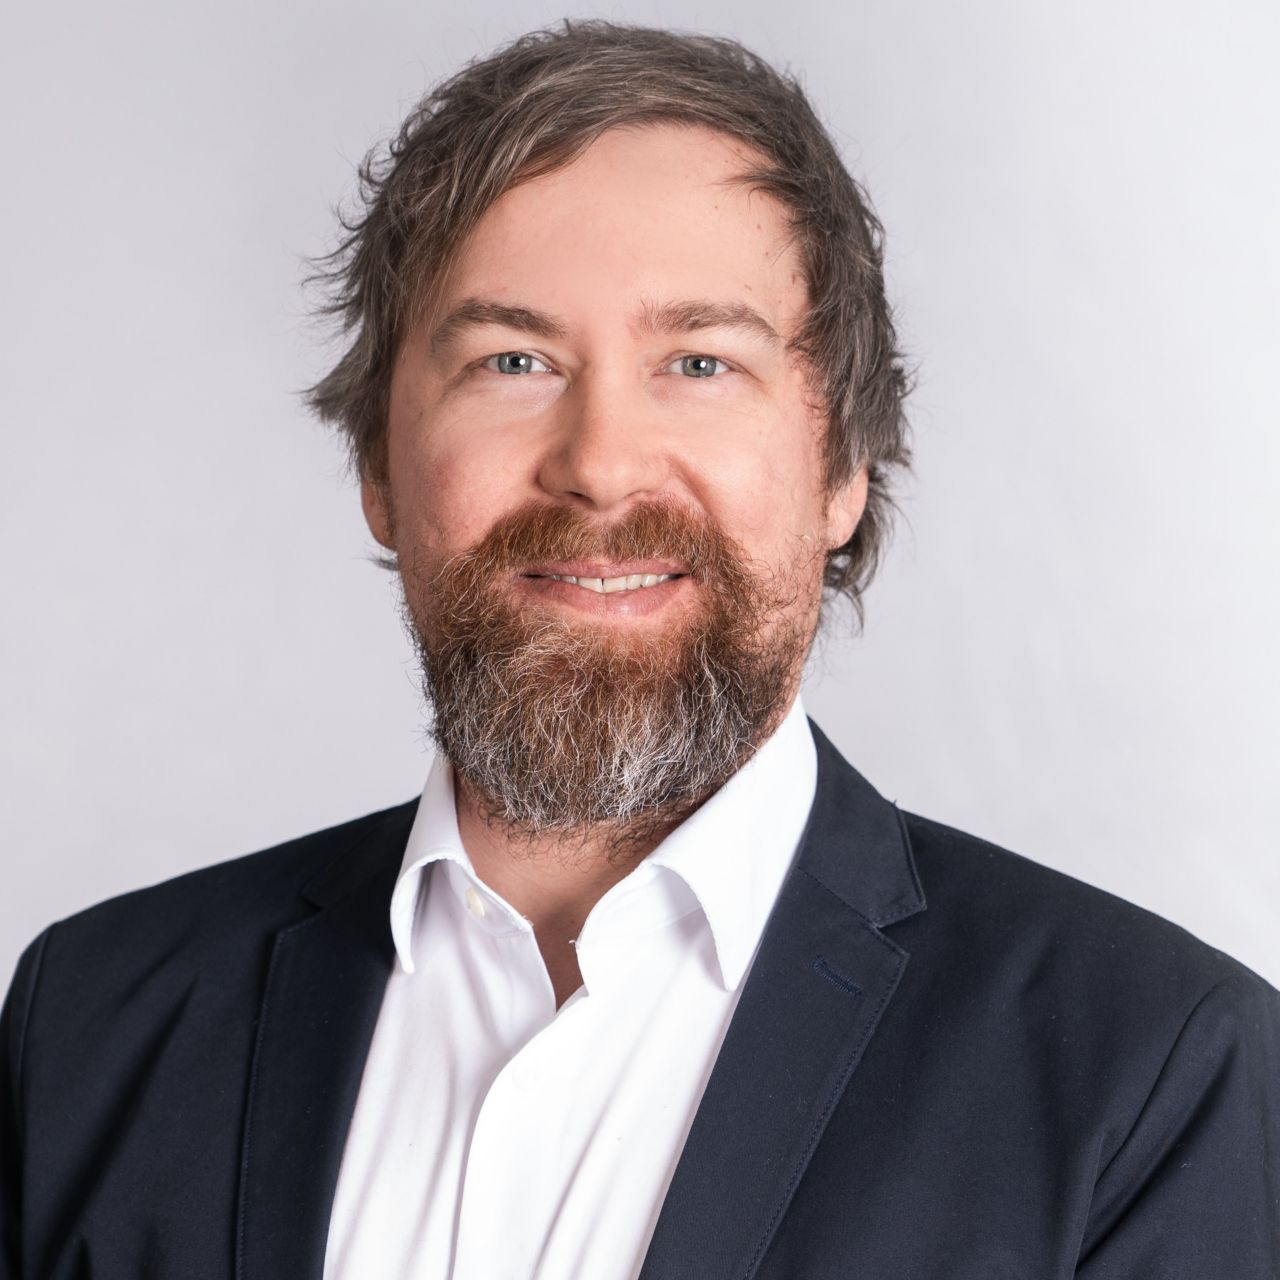 Jochen Kammerer, Sika